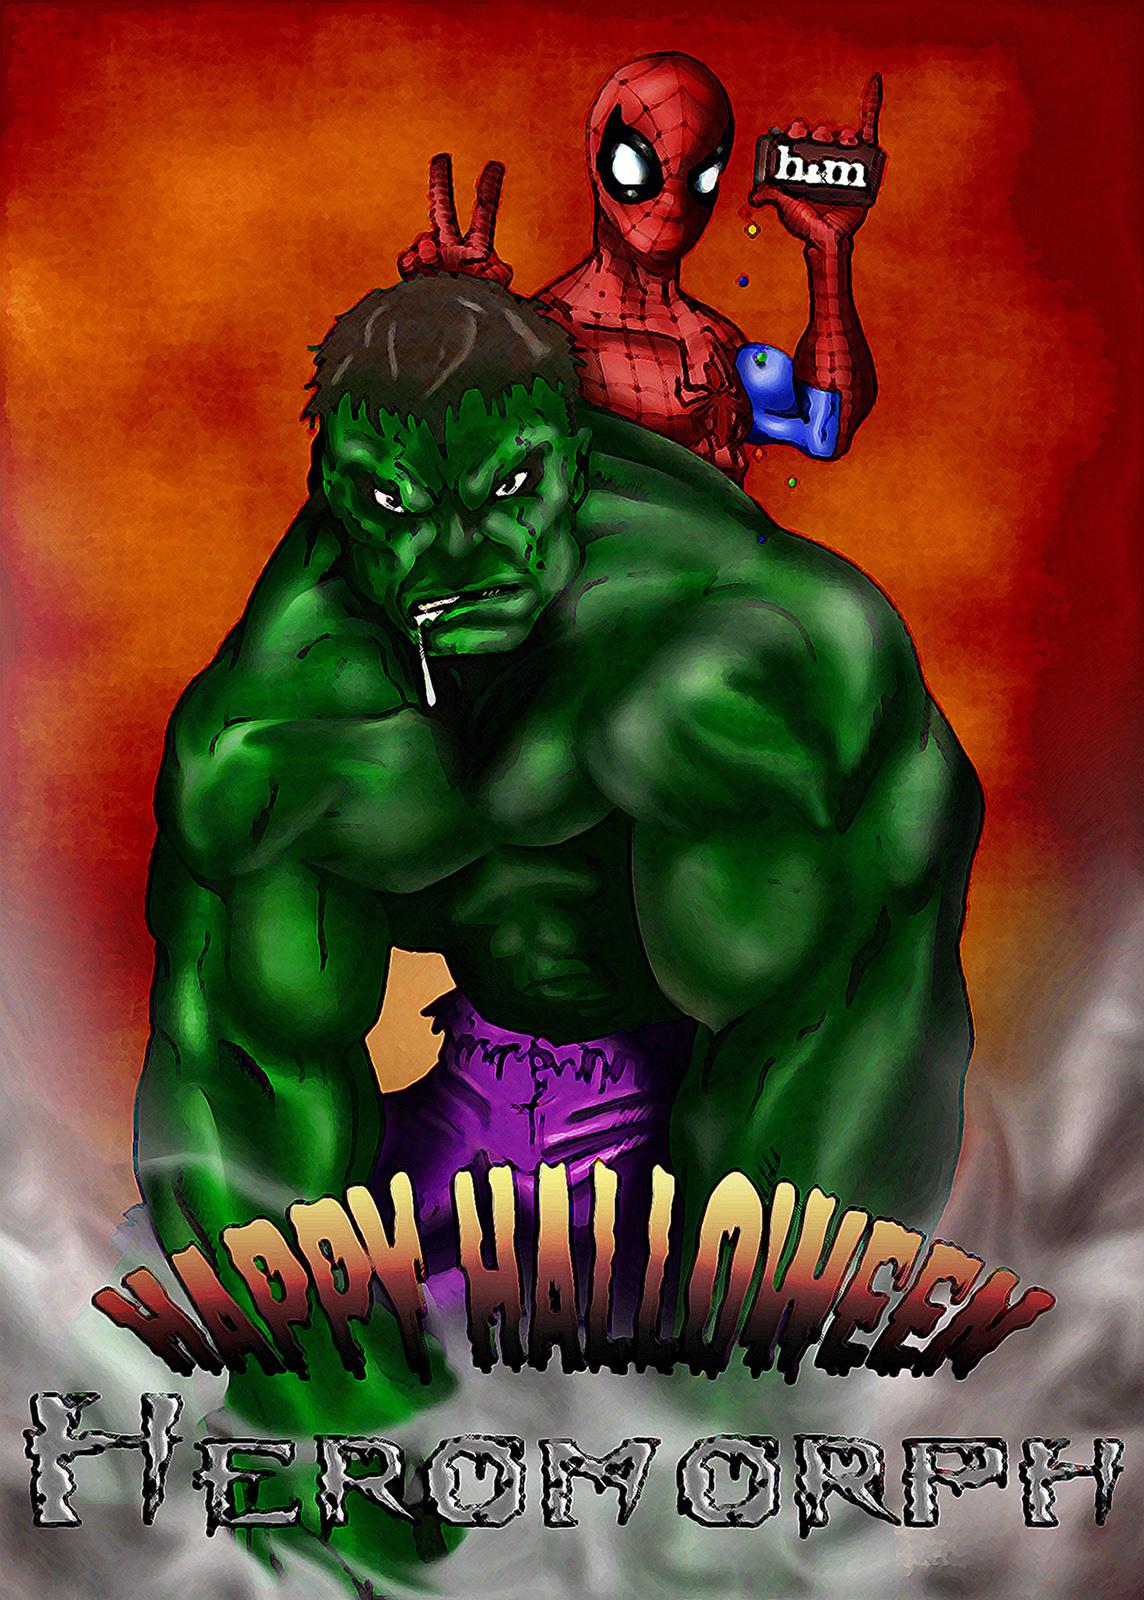 Hulk and Spidey